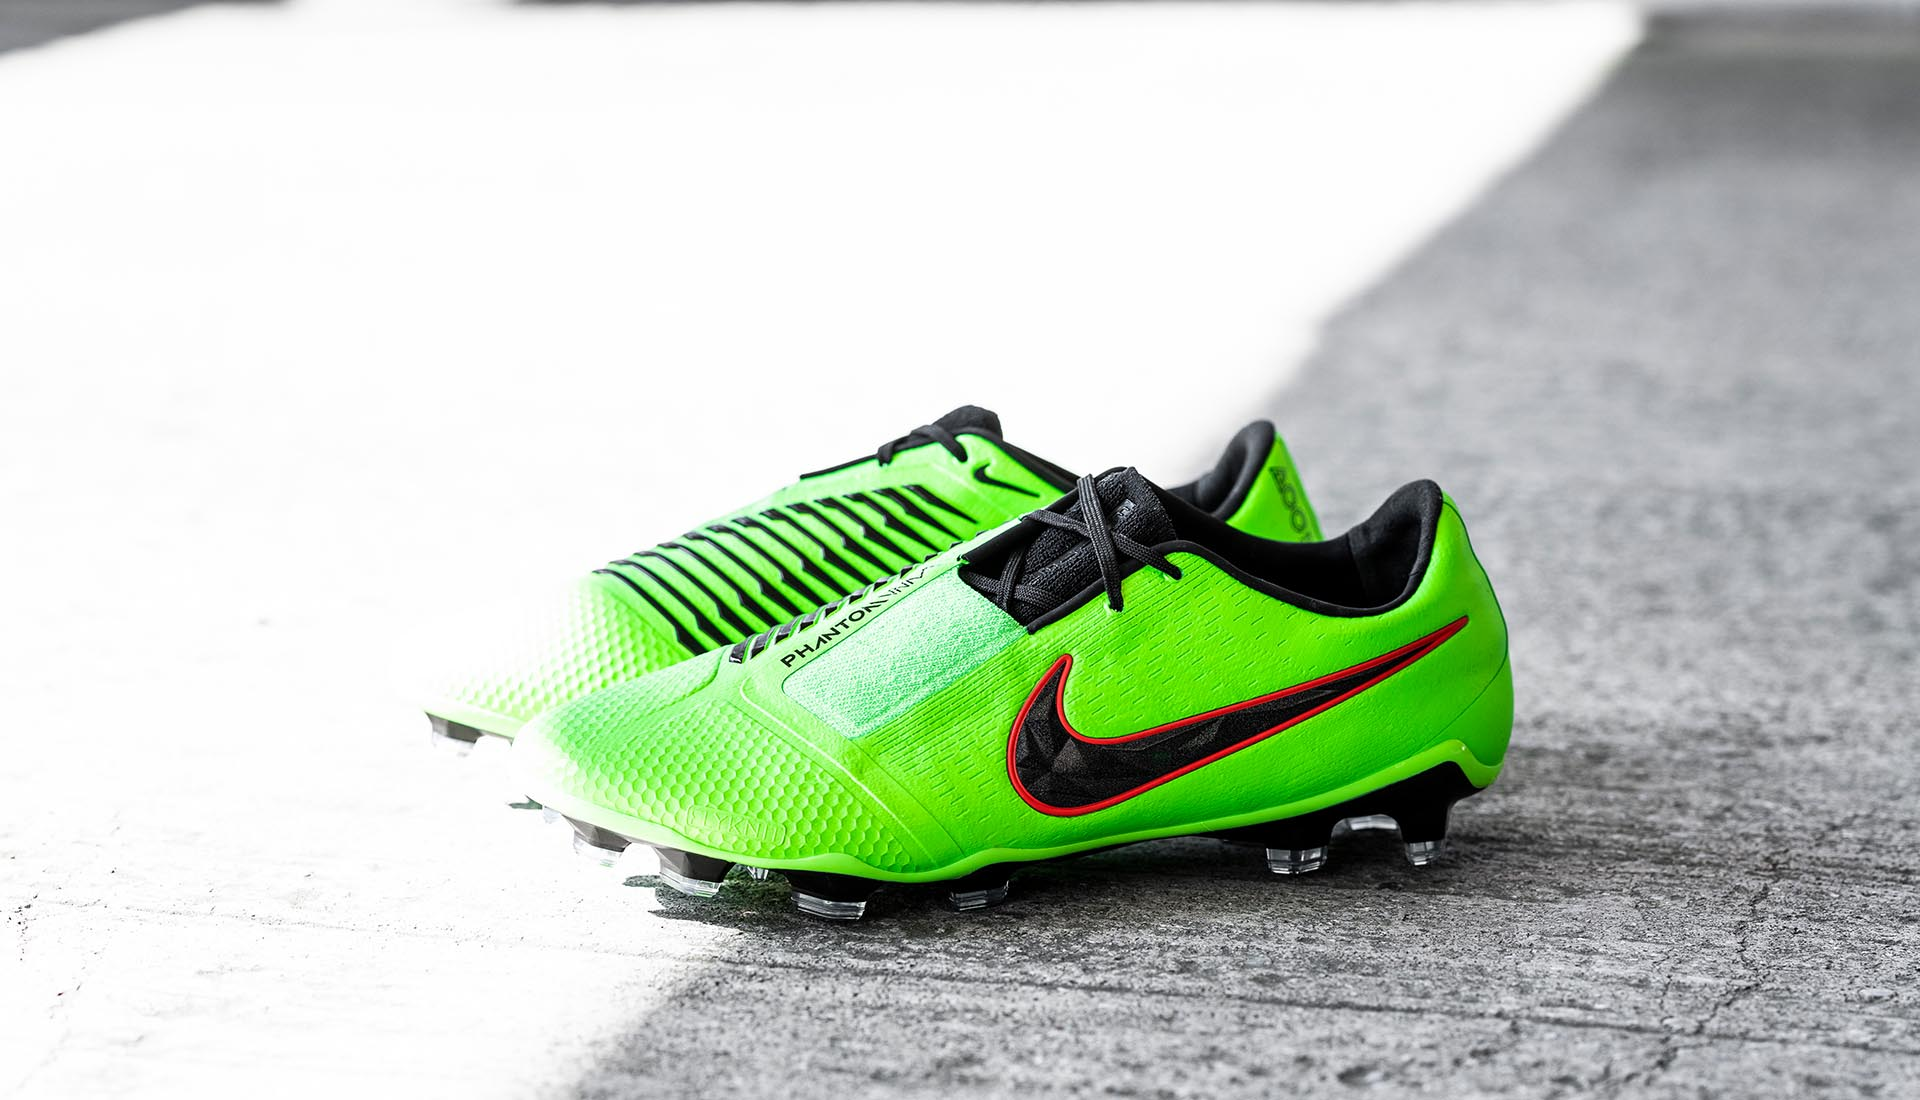 Bo suu tap giay da bong Nike Future lab 2 (II) nam 2020 (5)